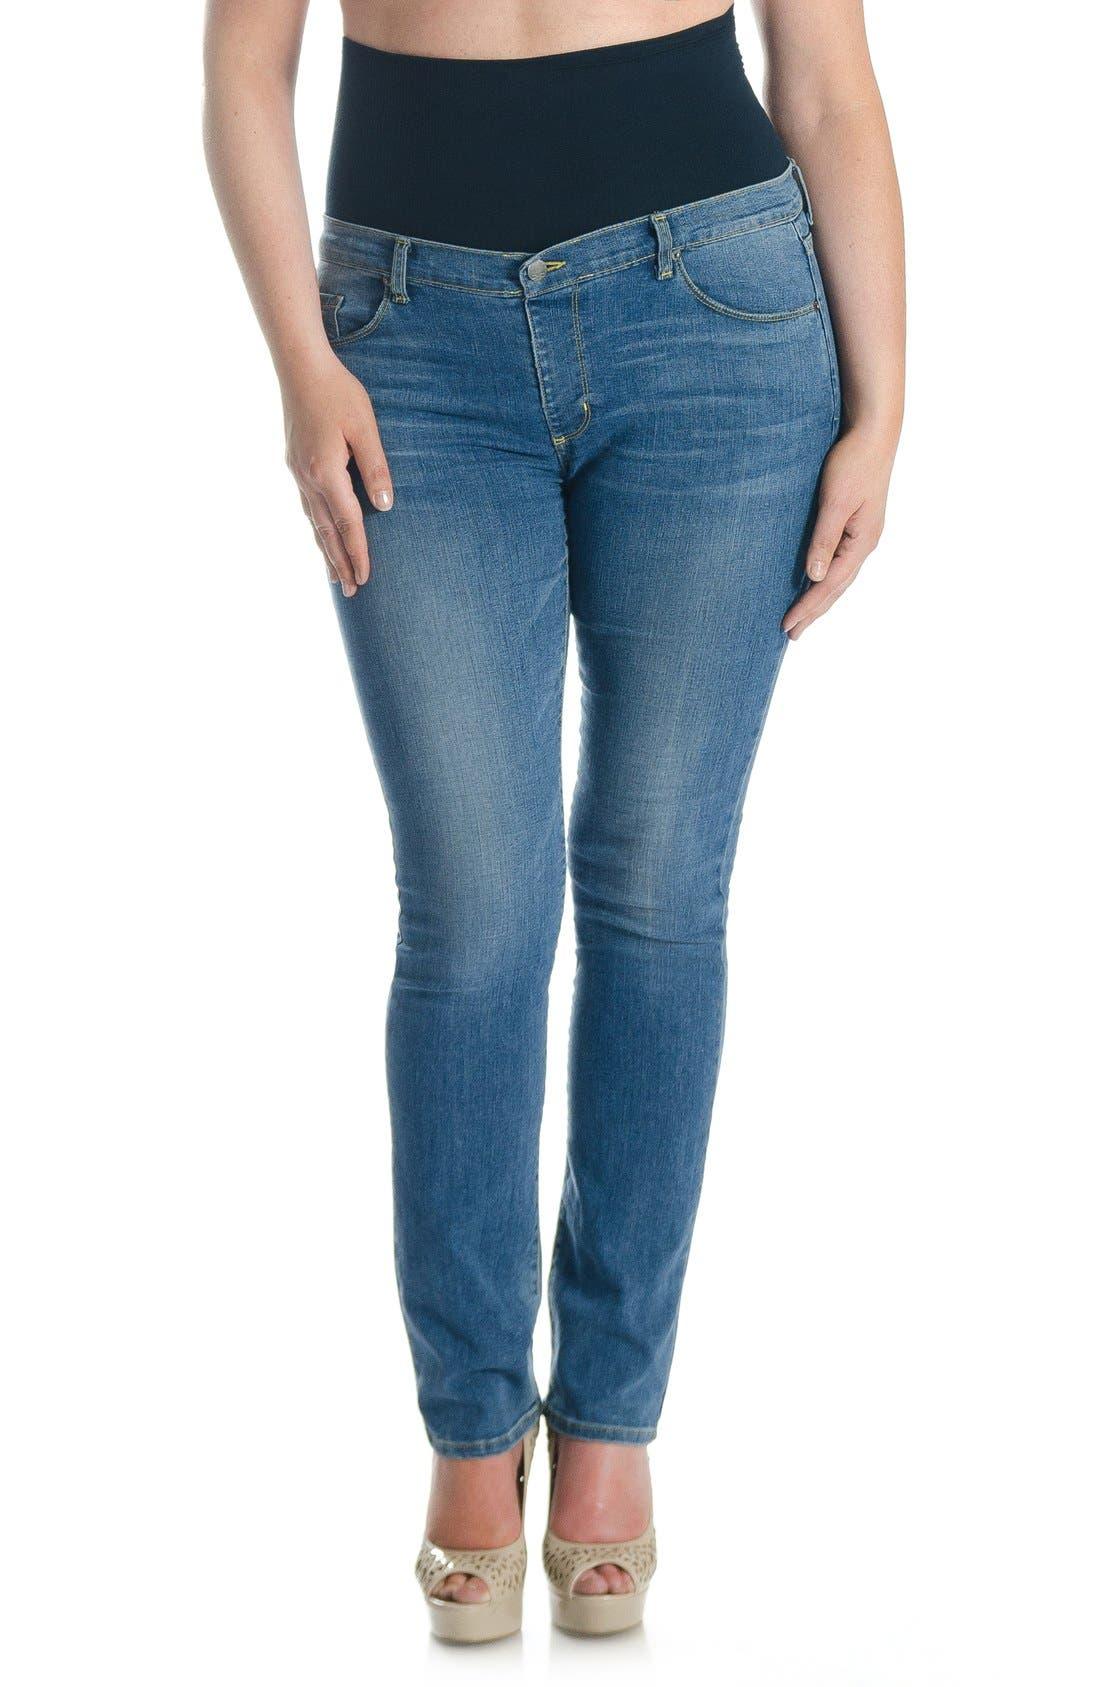 Tummy Trimmer Denim Mid Rise Straight LegShapewearJeans